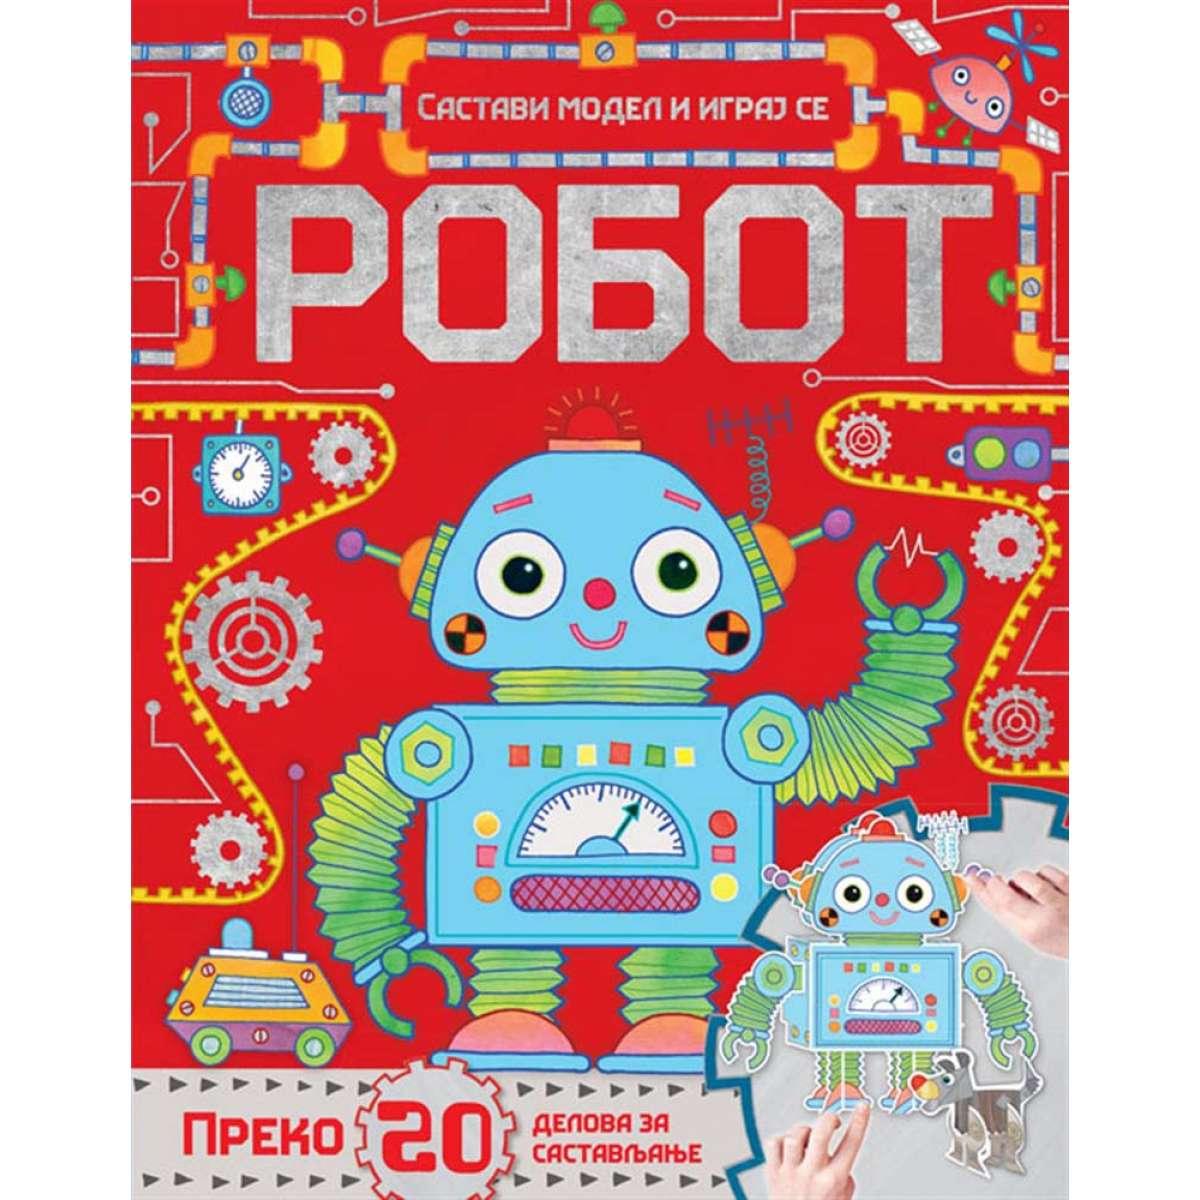 SASTAVI MODEL I IGRAJ SE: ROBOT